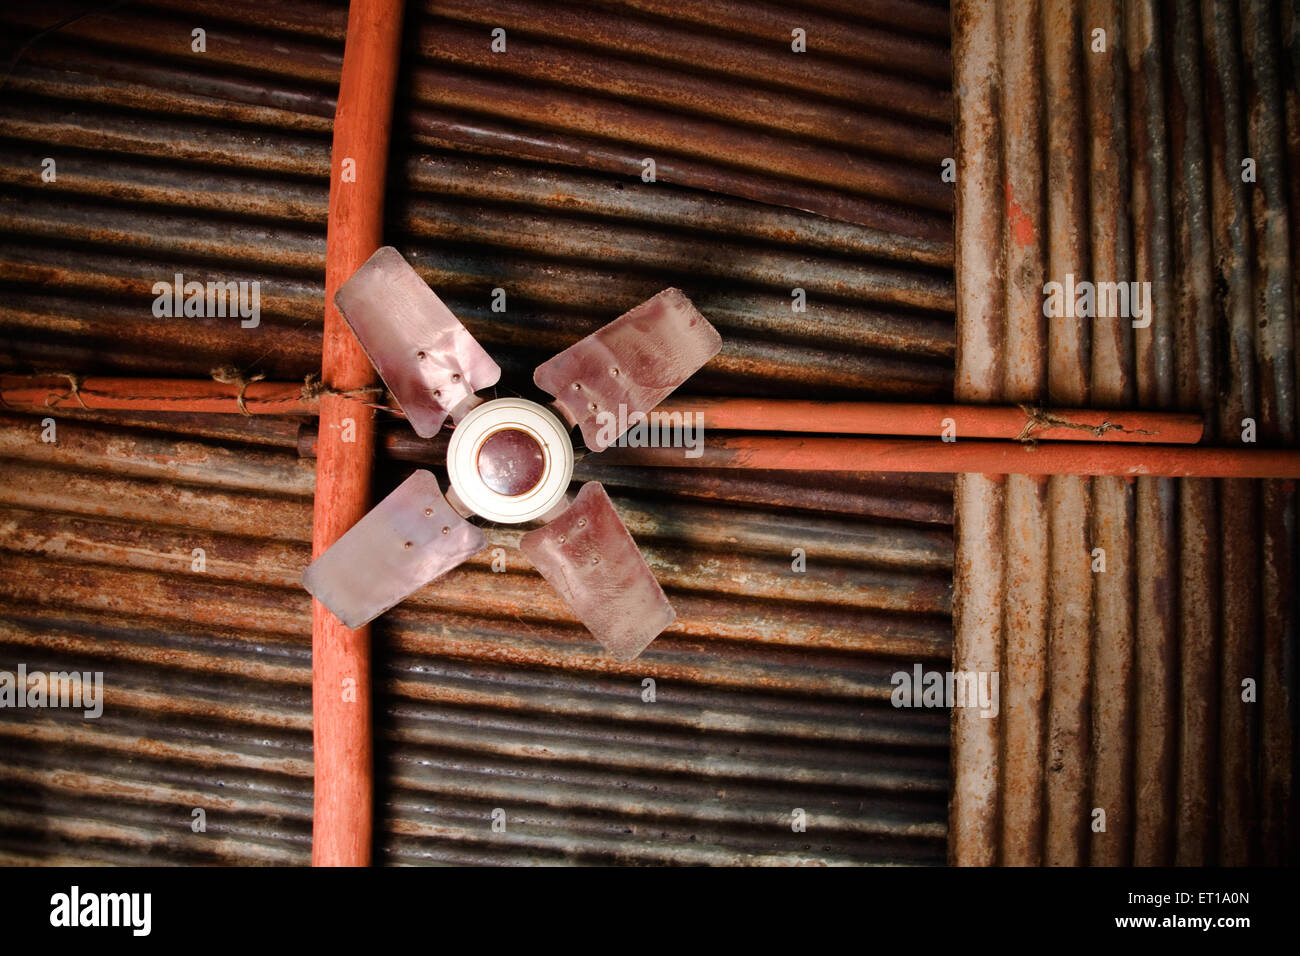 Ventilatore da soffitto ; Nandur ; Marathwada ; Maharashtra ; India Immagini Stock